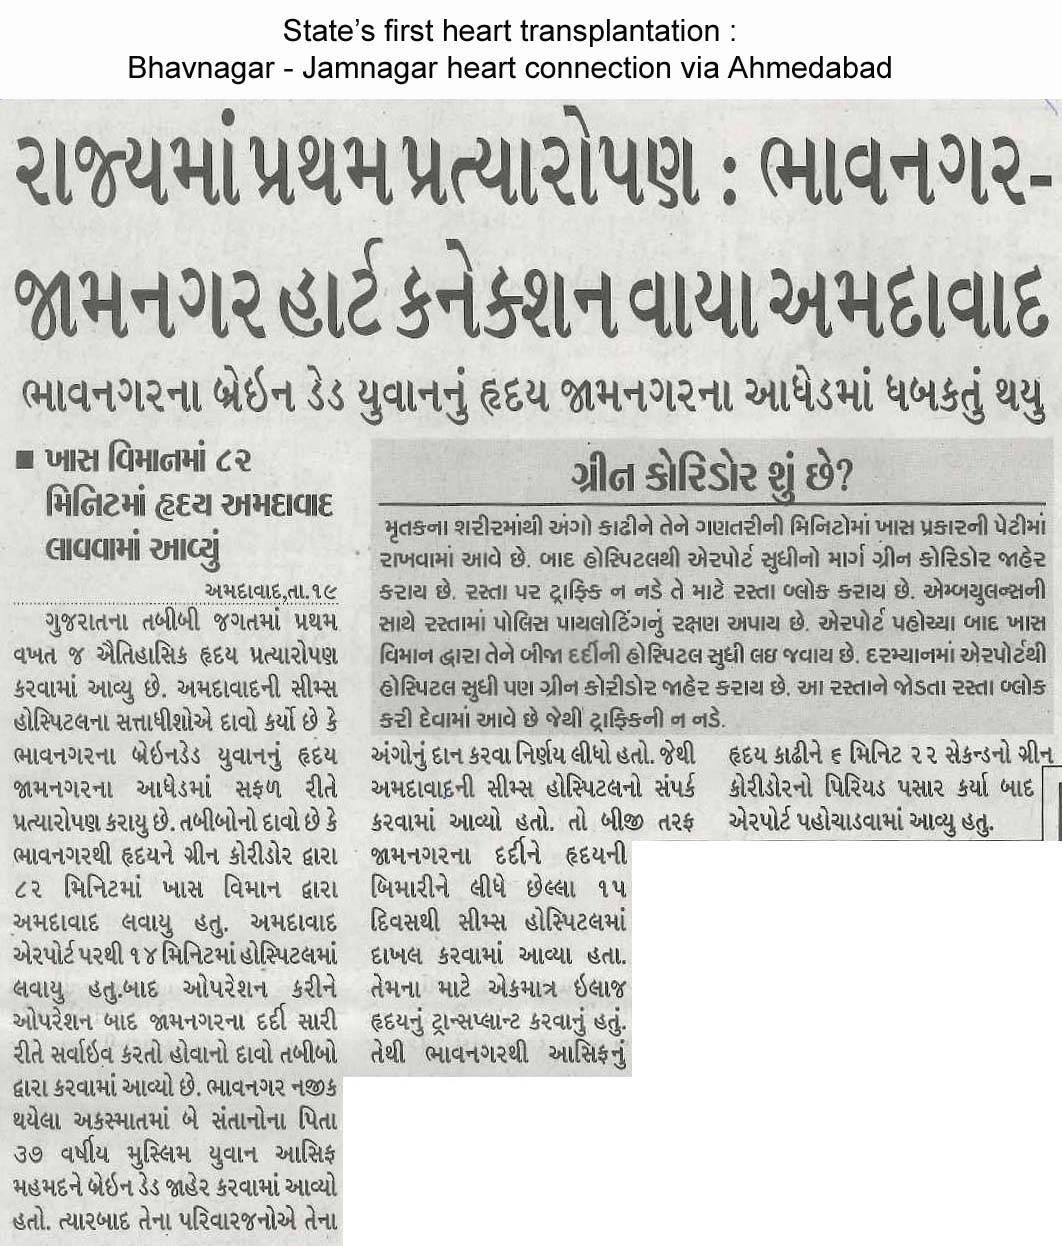 Sandesh (Ahd)_CIMS (1st Heart transplant in Gujarat)_20.12.16_Pg 03